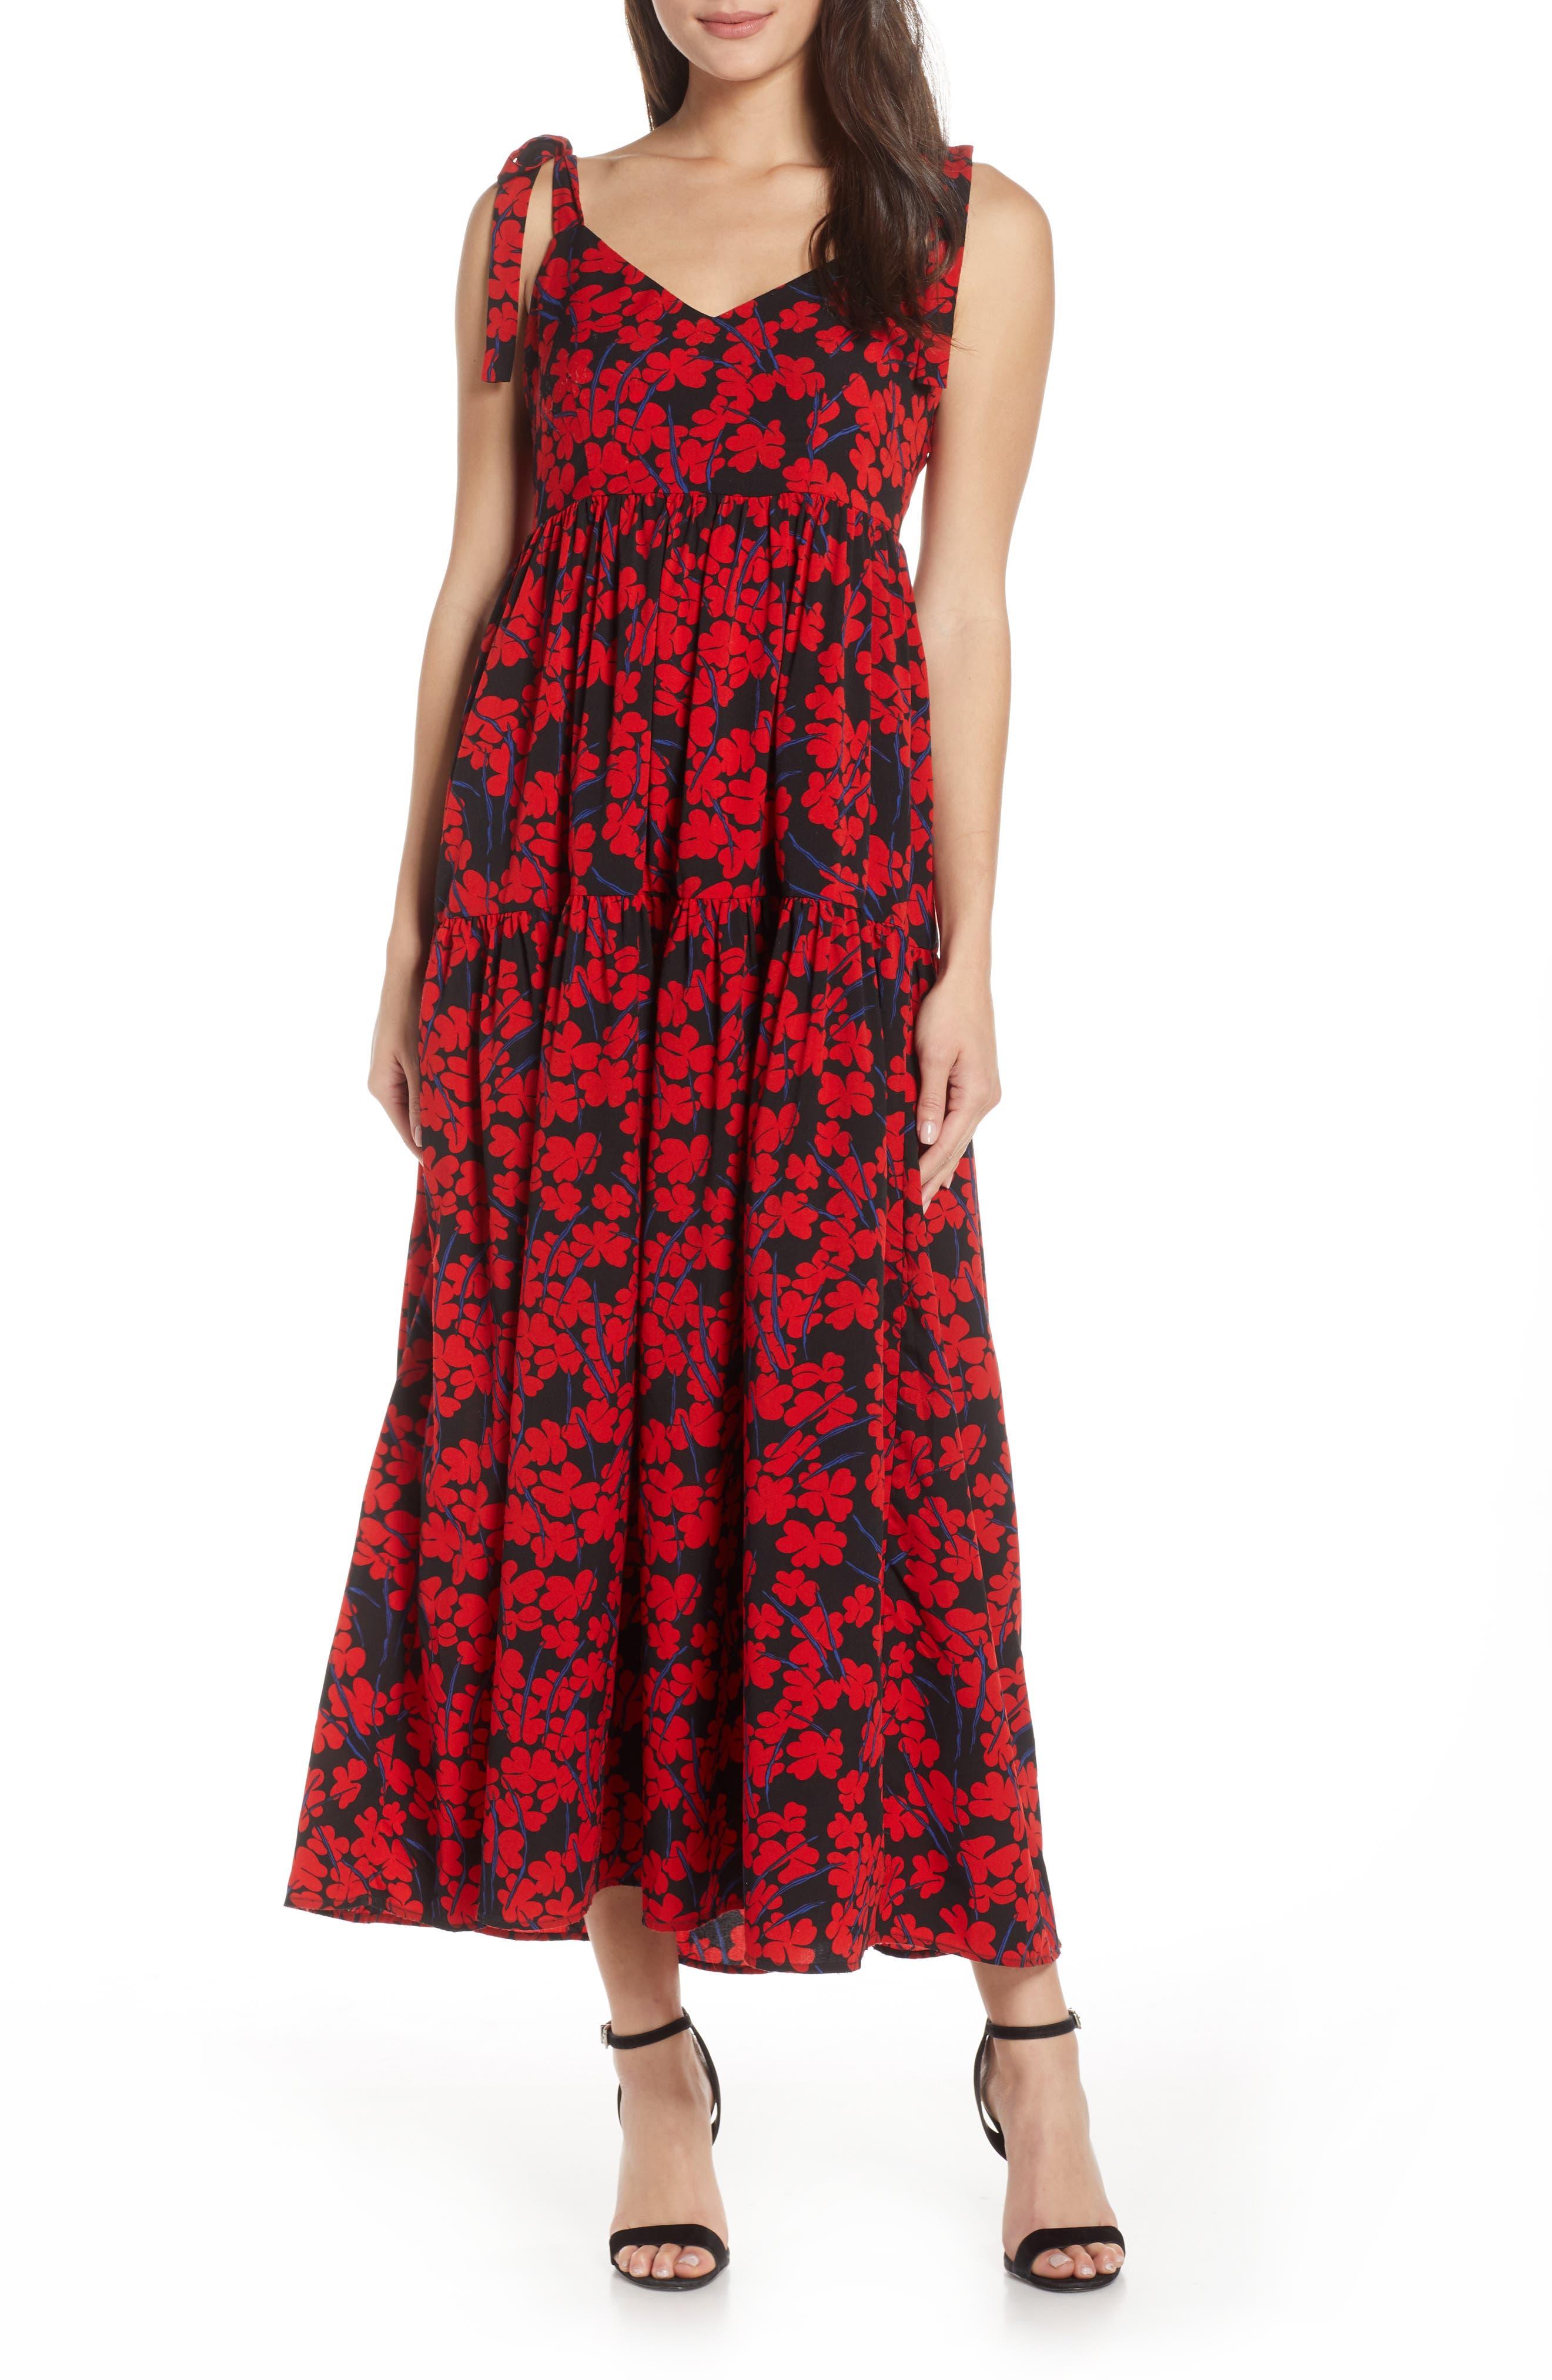 Caara Steffi Floral Print Maxi Dress, Red